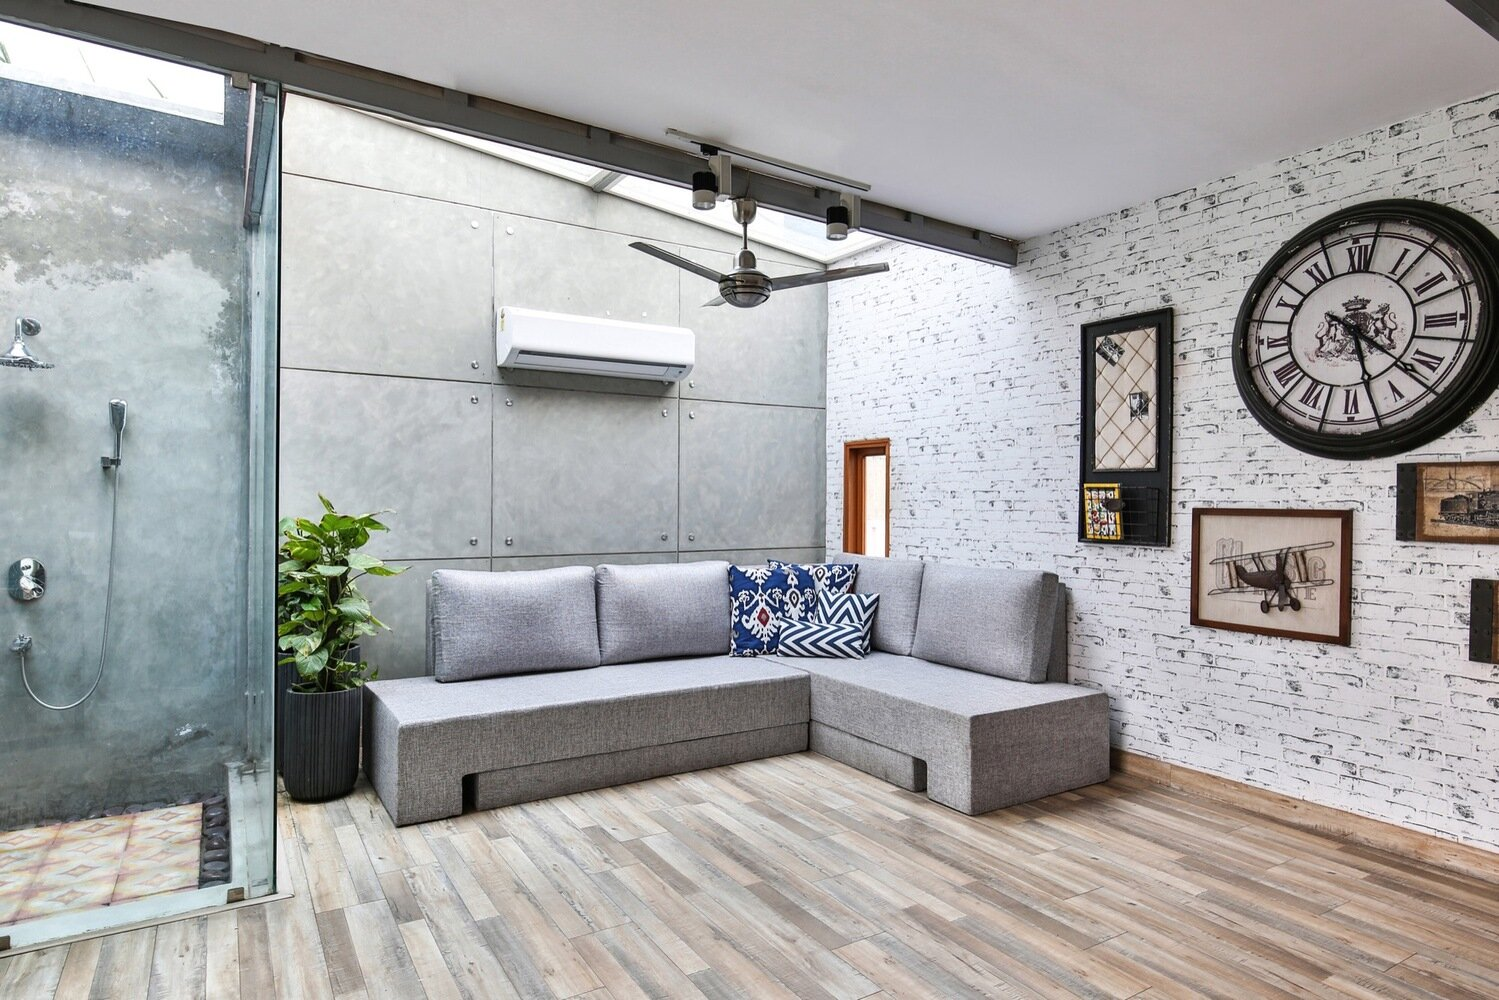 Studio for Two - Studio Wood - India - Living Room Sofa - Humble Homes